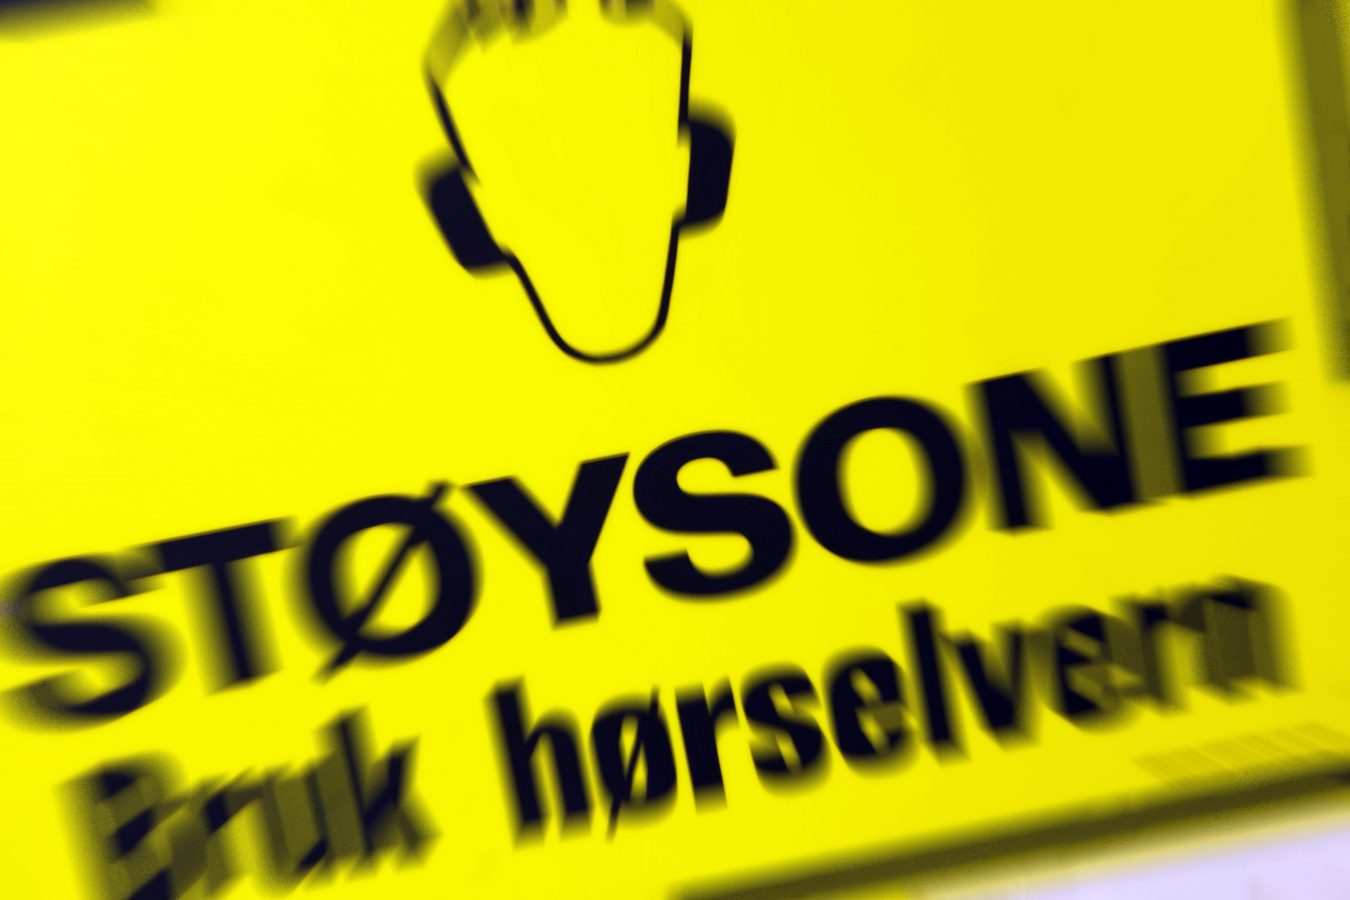 Advarselsskilt med påbud om hørselsvern. Støysone. Støy gir hørselsskade.  Foto: © Tore Wuttudal/Samfoto